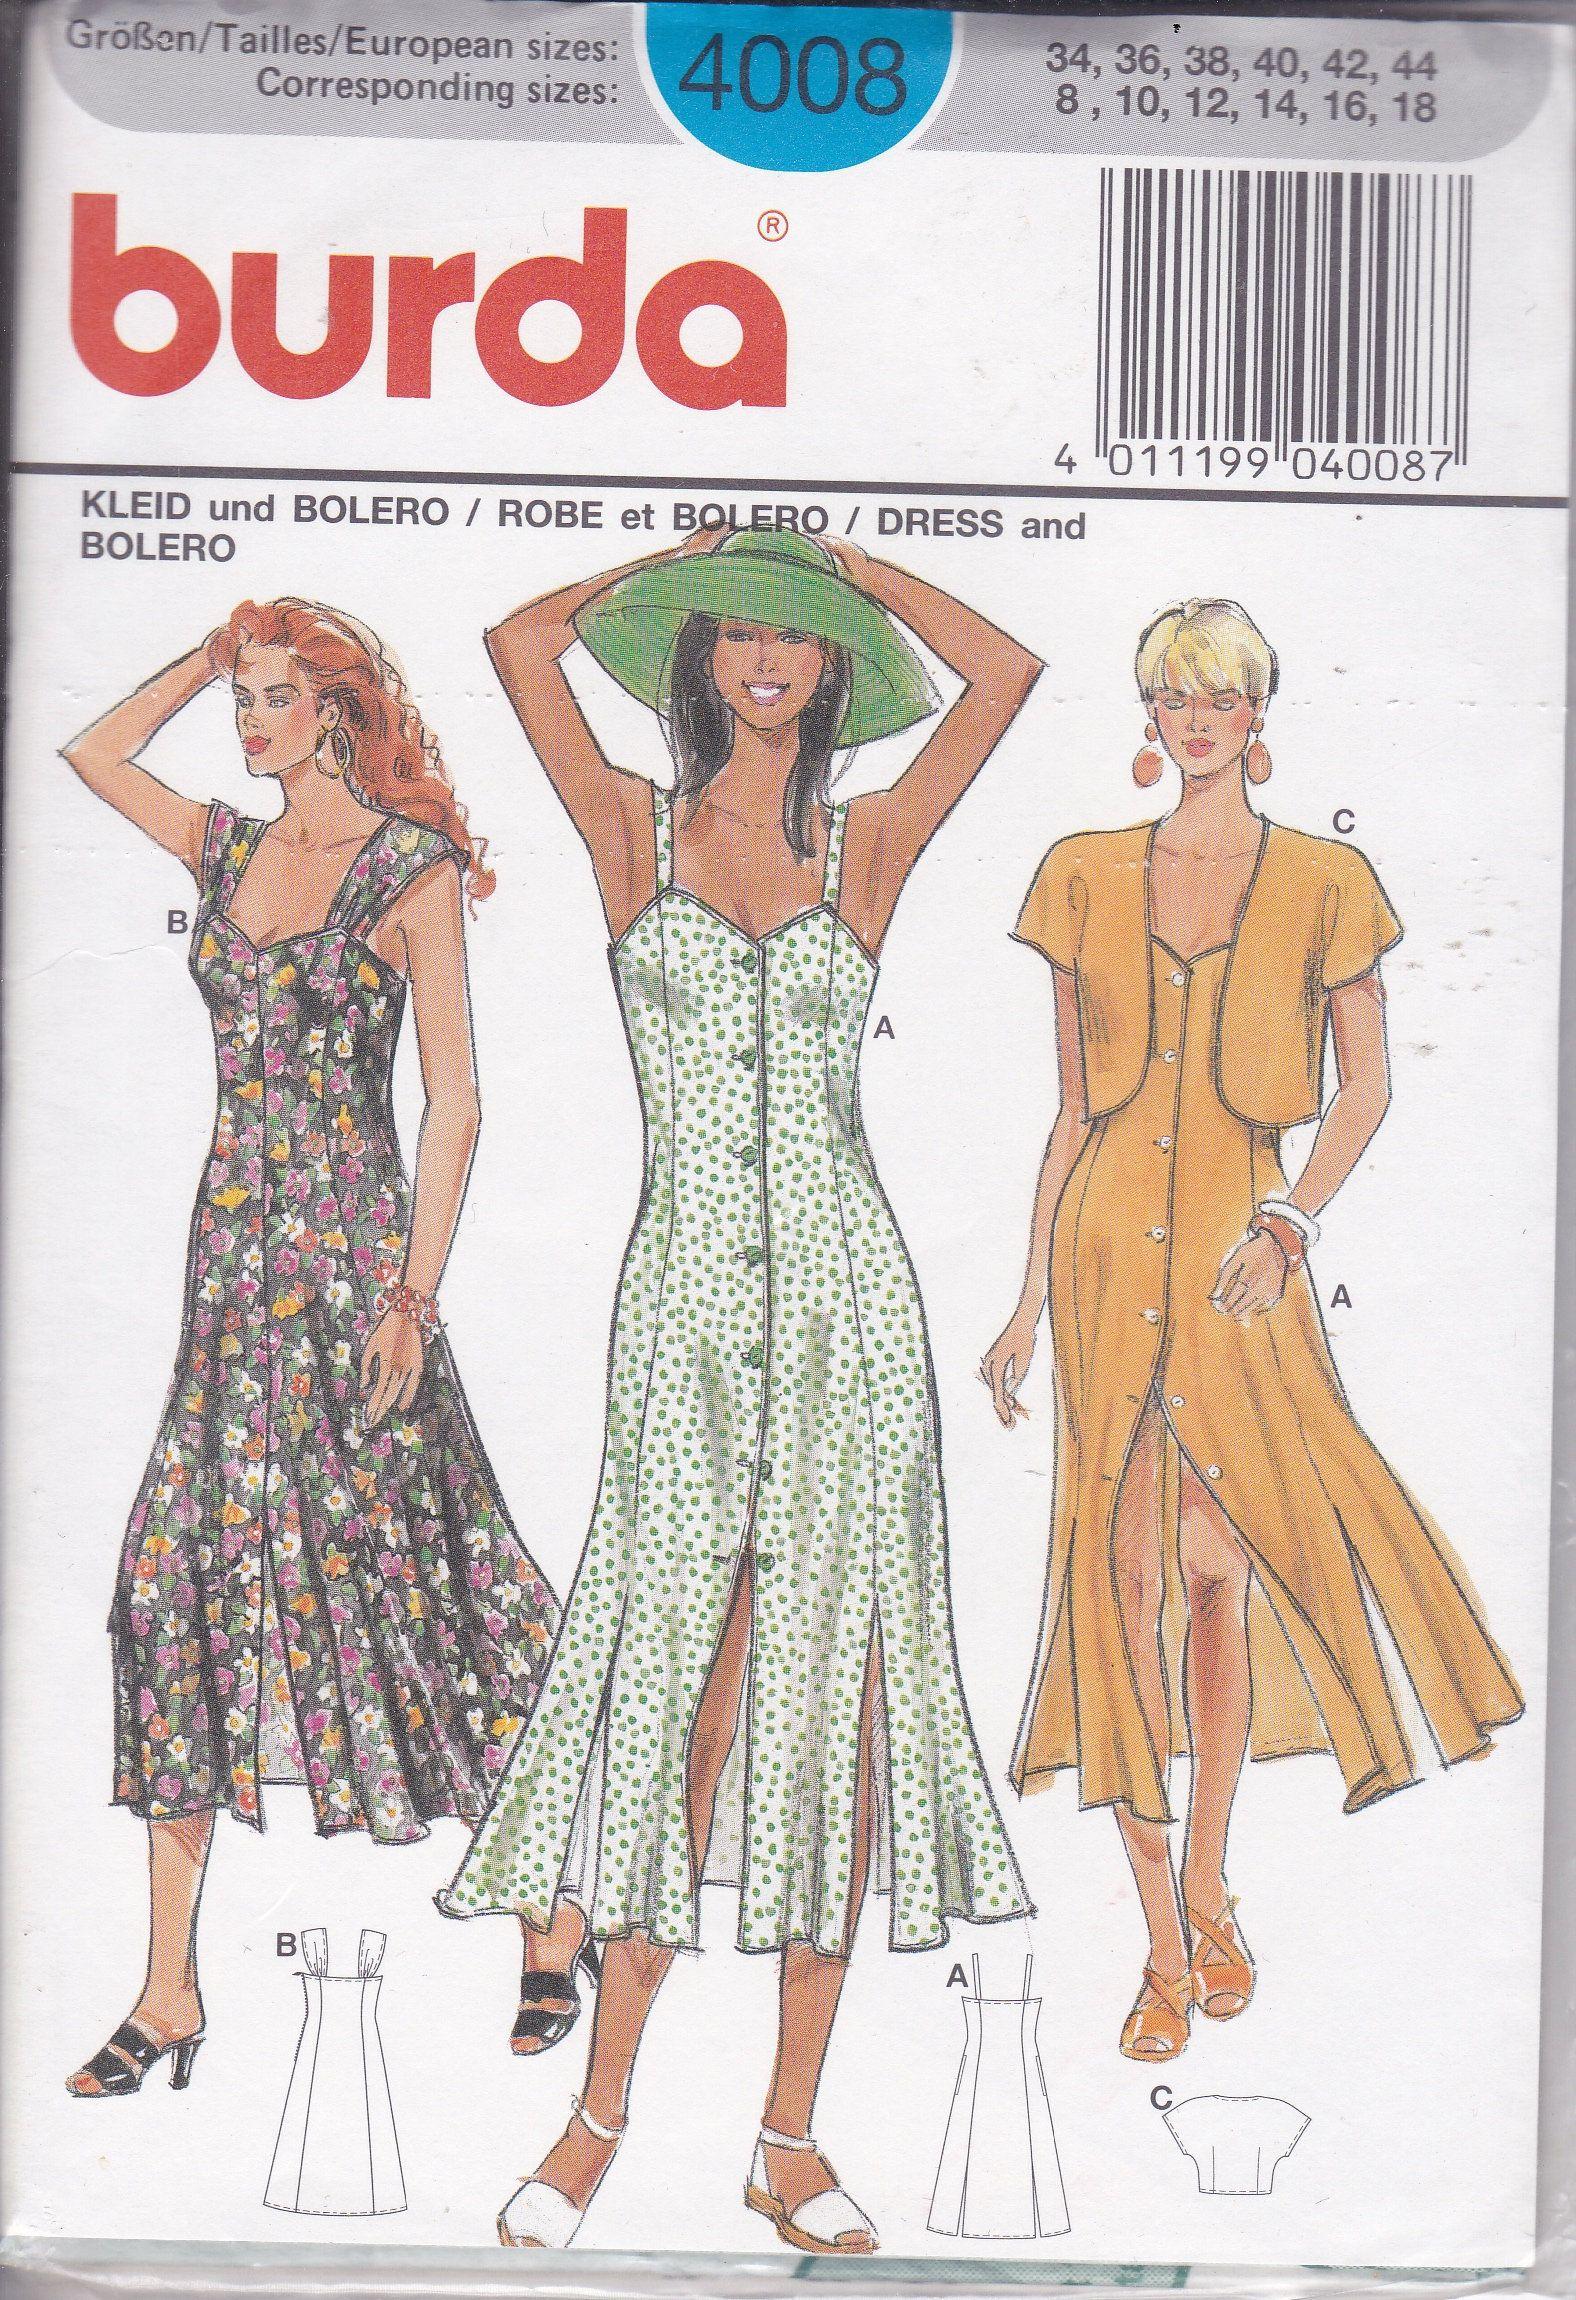 90s Sewing Pattern For Summer Dress Jacket Bolero Ff Uncut Burda Pattern 4008 Misses Size 8 18 Retro 1990s 90 S Women S Sewing Pattern Summer Dresses Plus Size Sewing Patterns Women S Sewing Pattern